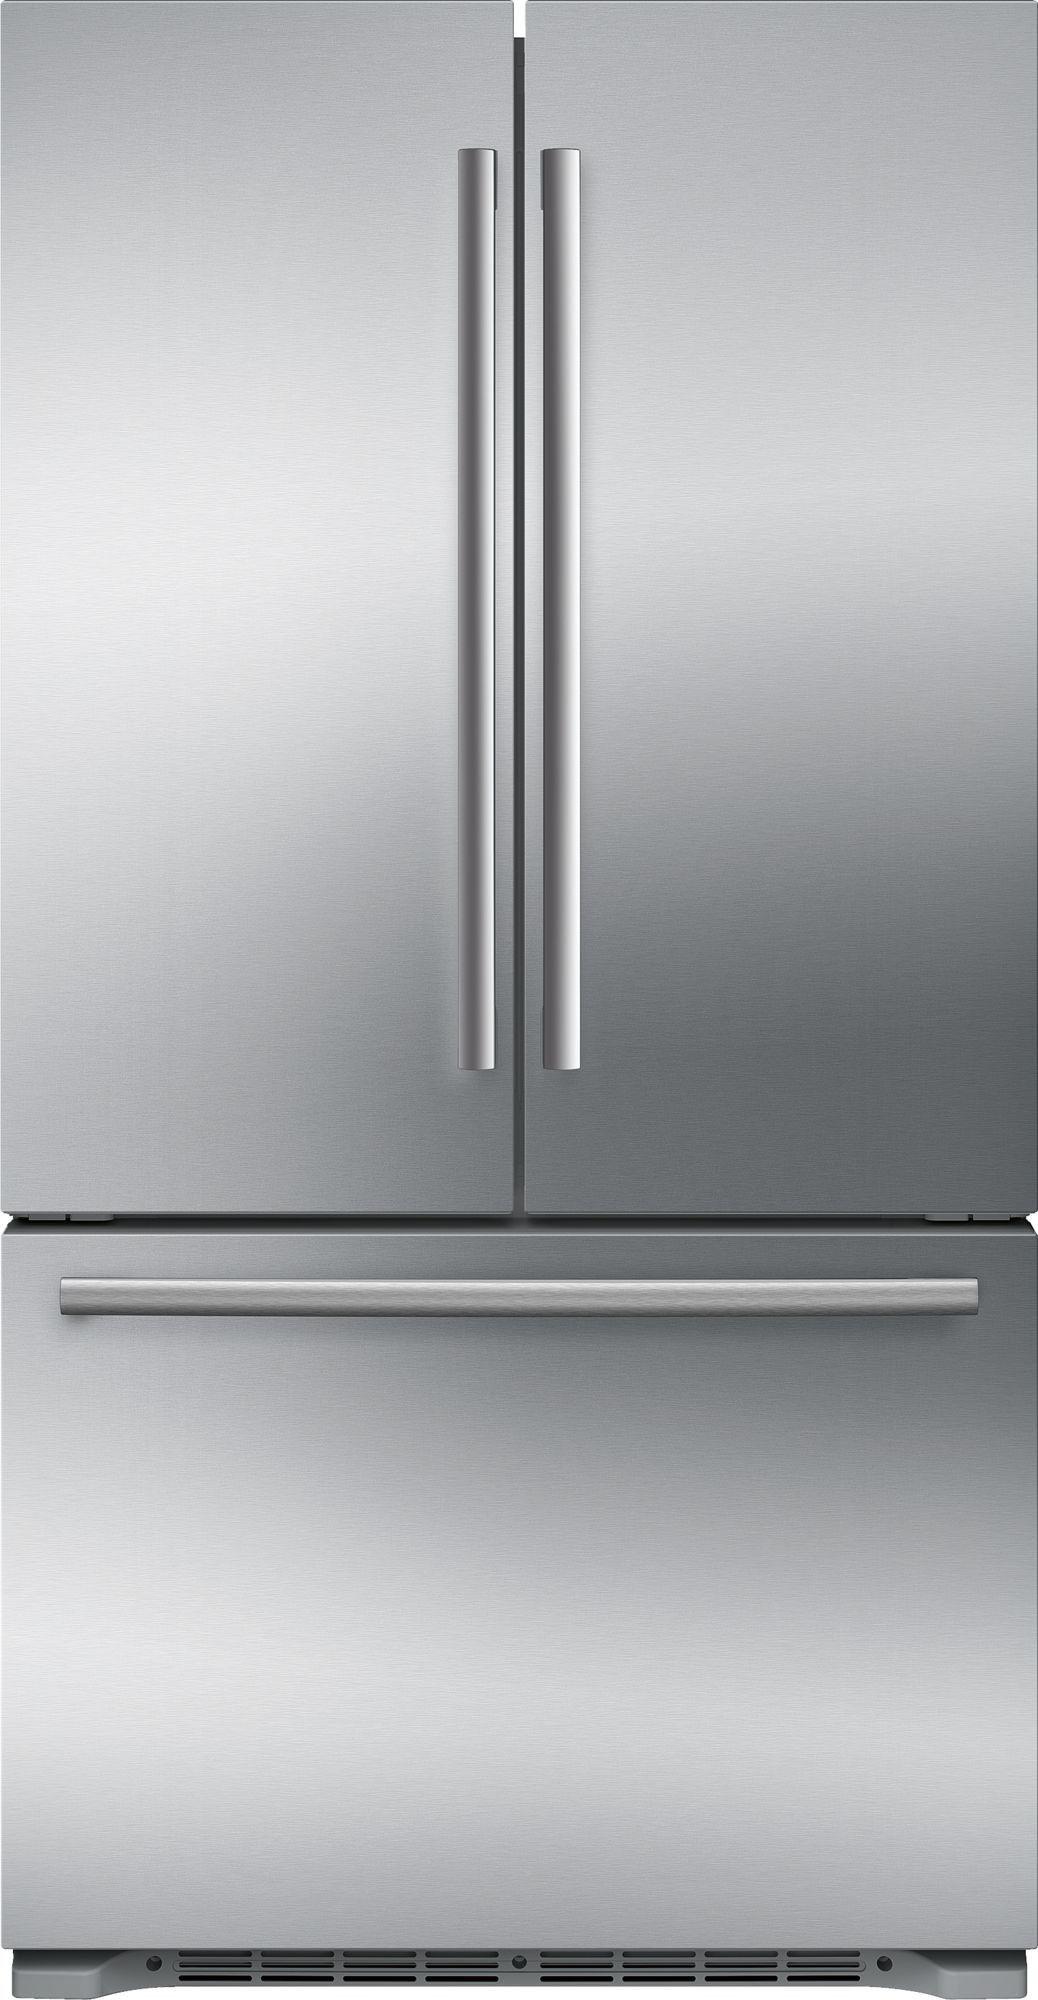 Bosch 800 Series B21ct80sns Counter Depth Refrigerator French Door Refrigerator Glass Shelves Kitchen